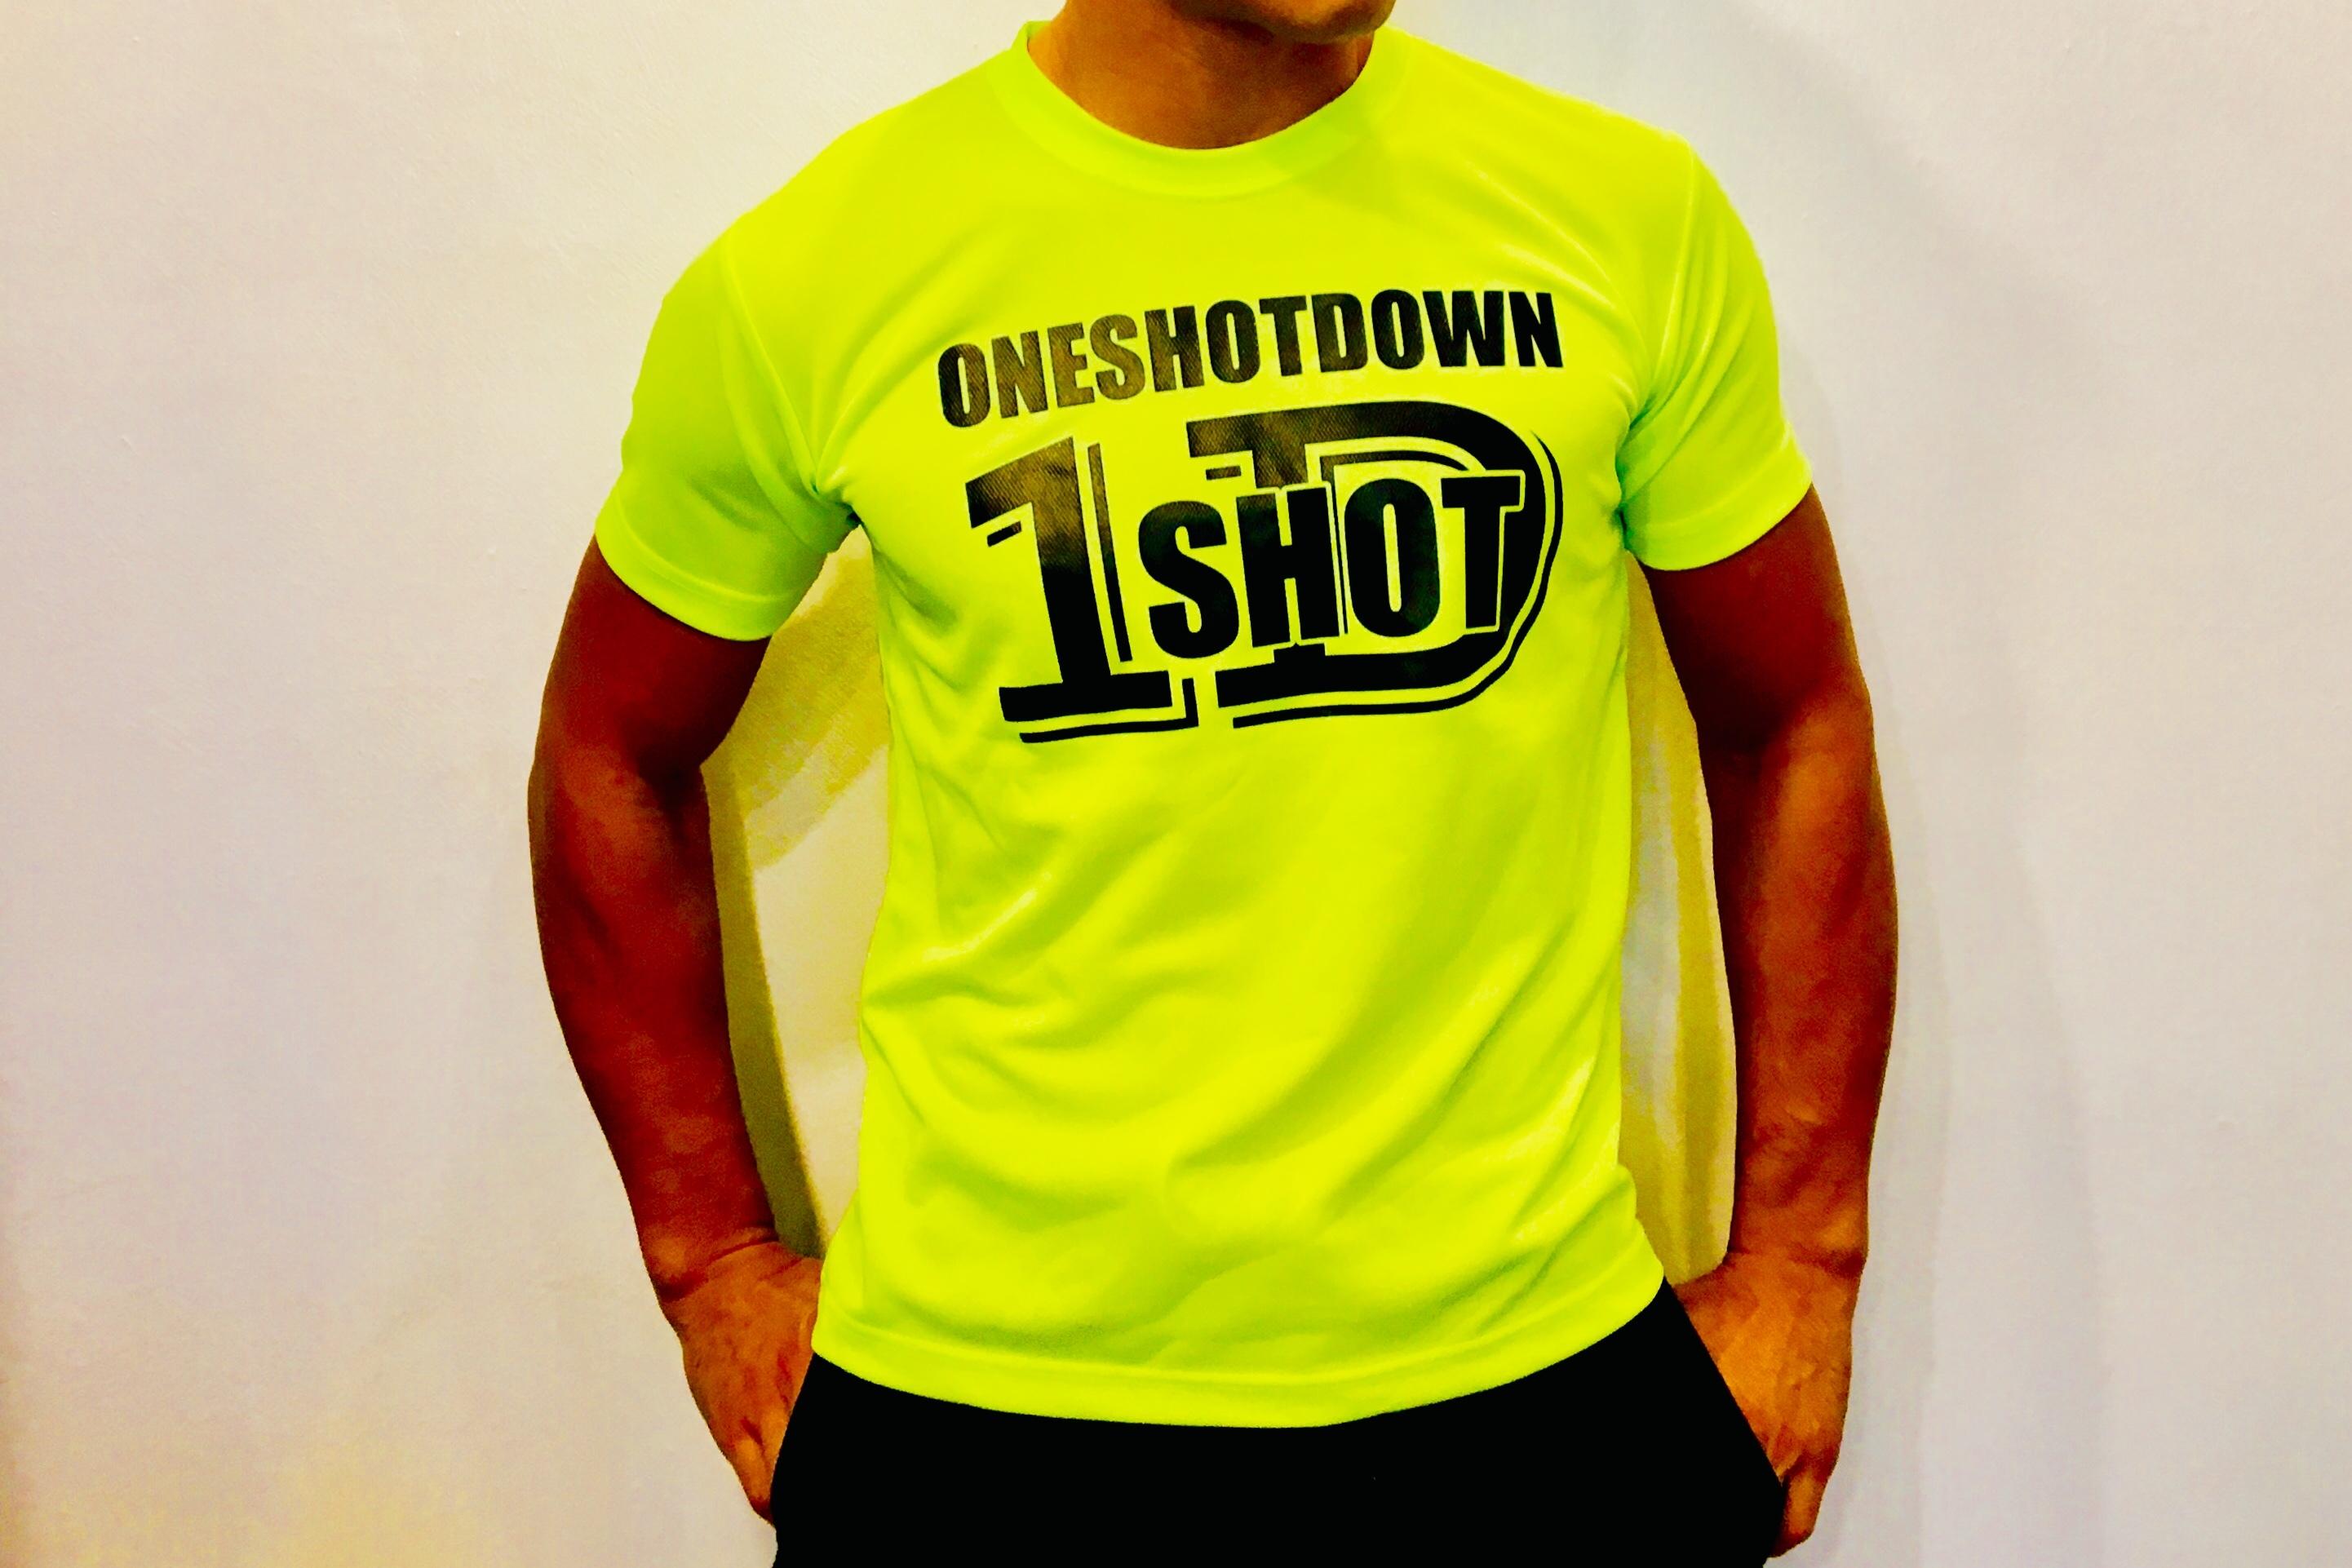 ONESHOTDOWN ネオンカラードライTシャツ - 画像4